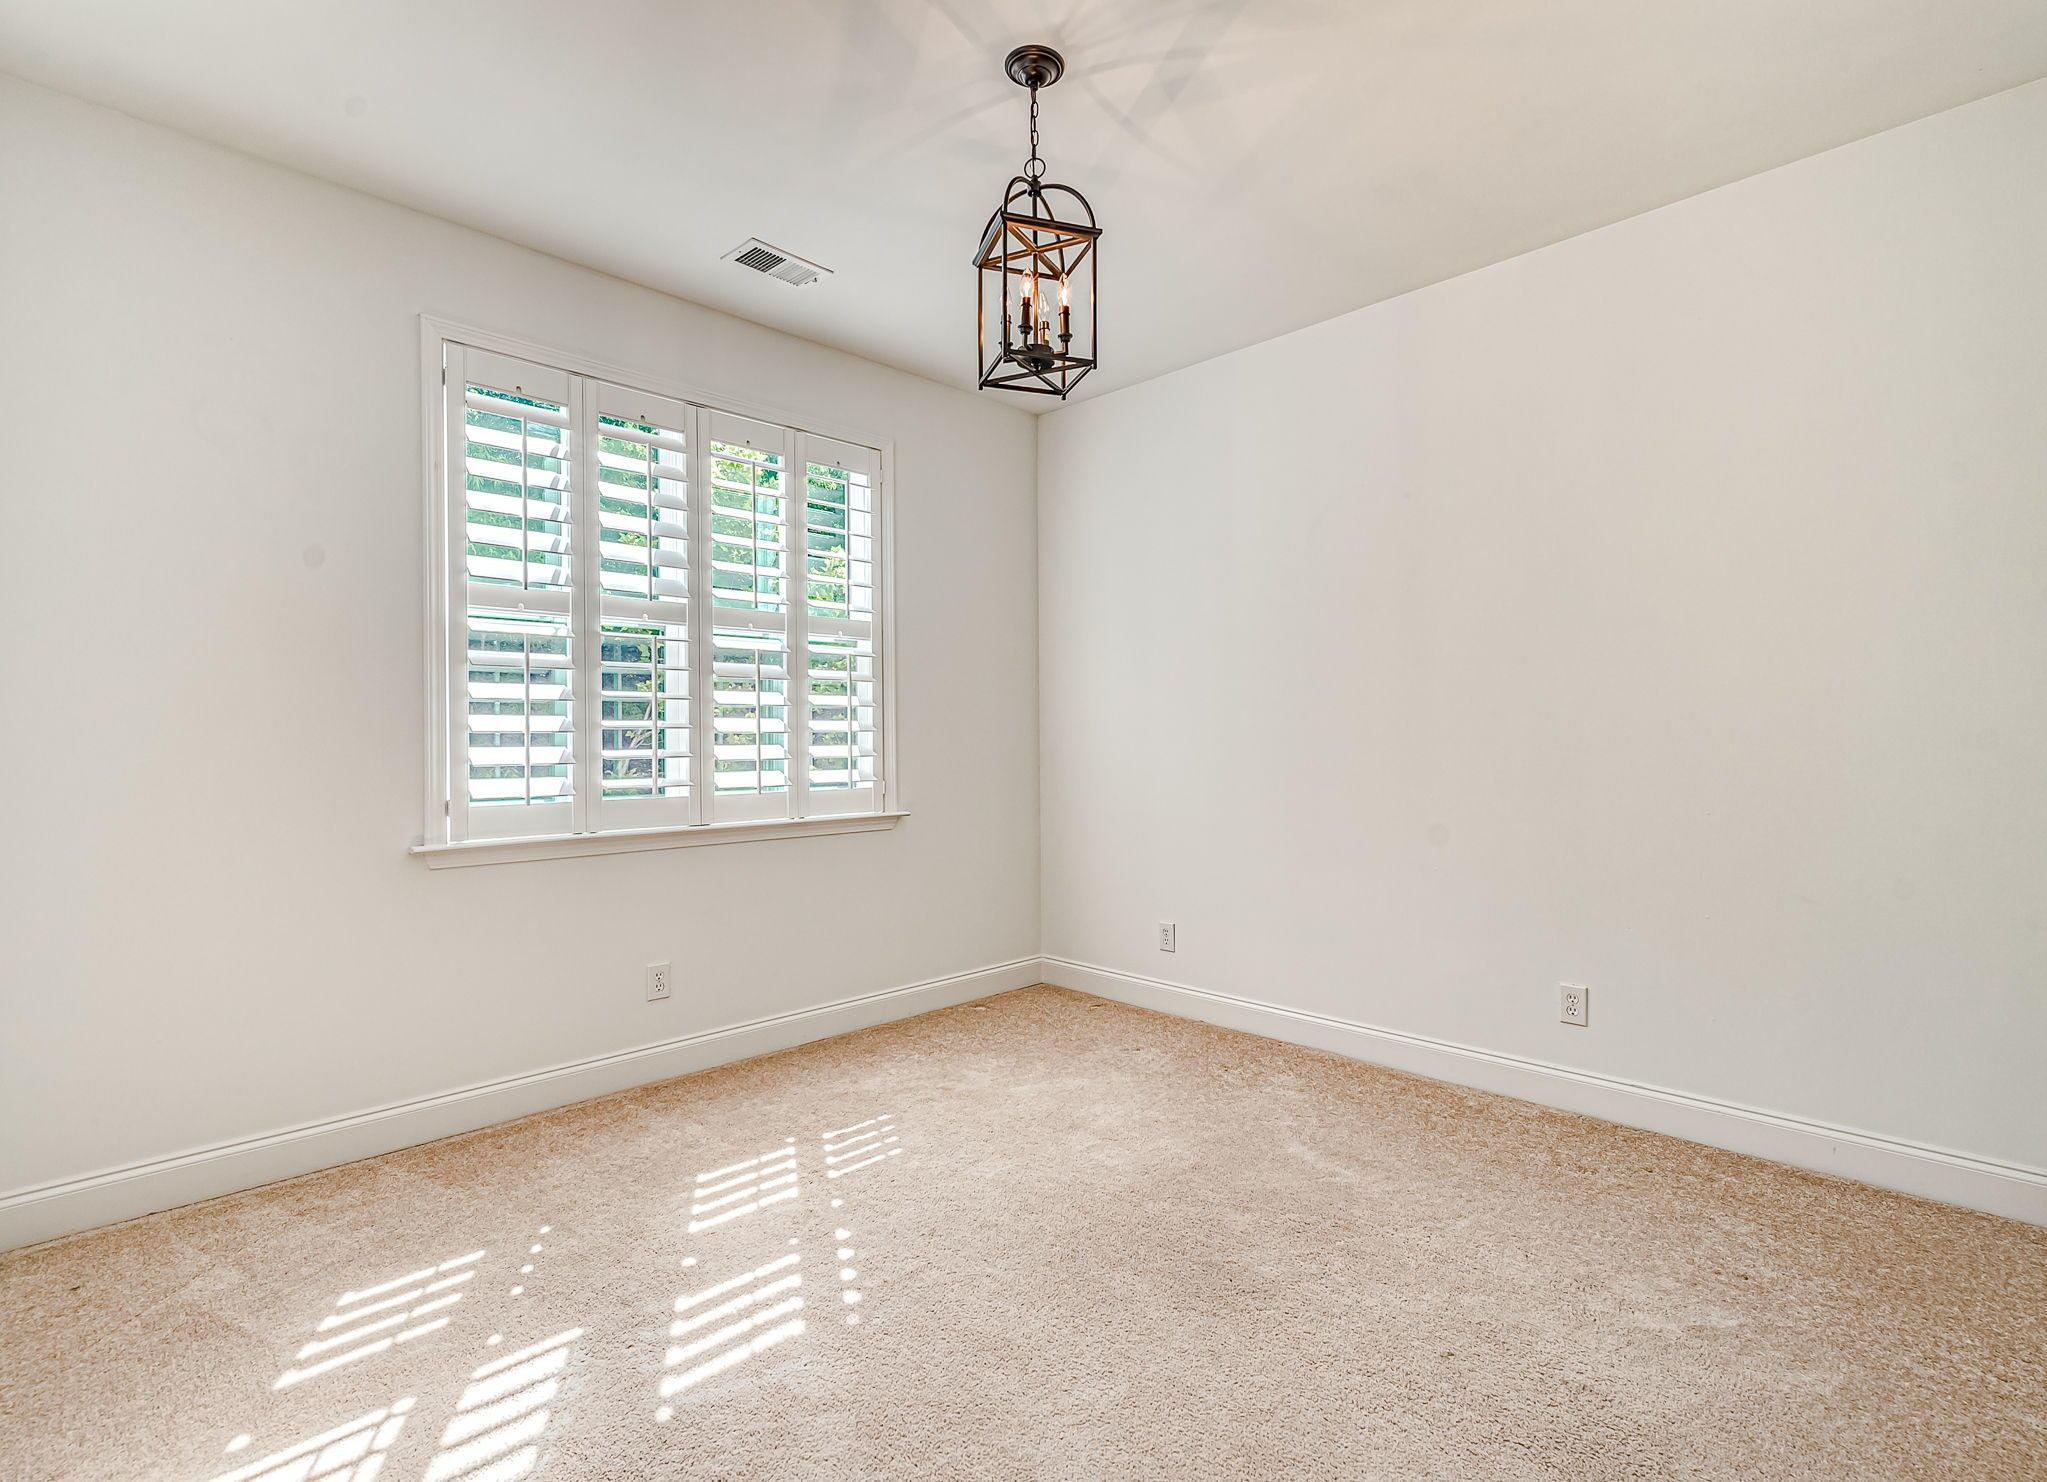 Dunes West Homes For Sale - 2476 Kings Gate, Mount Pleasant, SC - 7